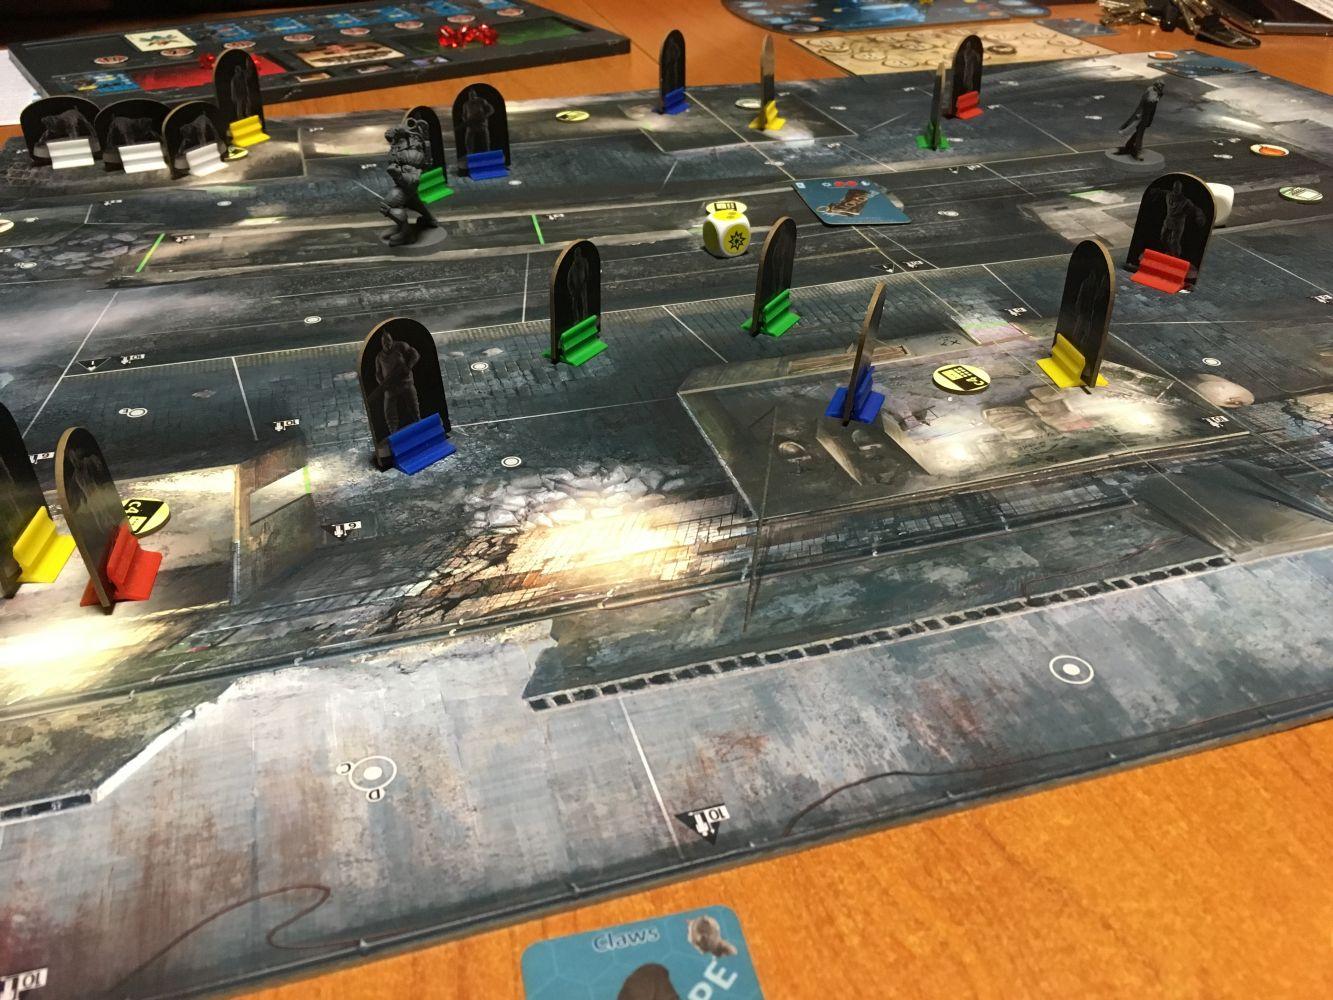 Le plateau de jeu du prototype